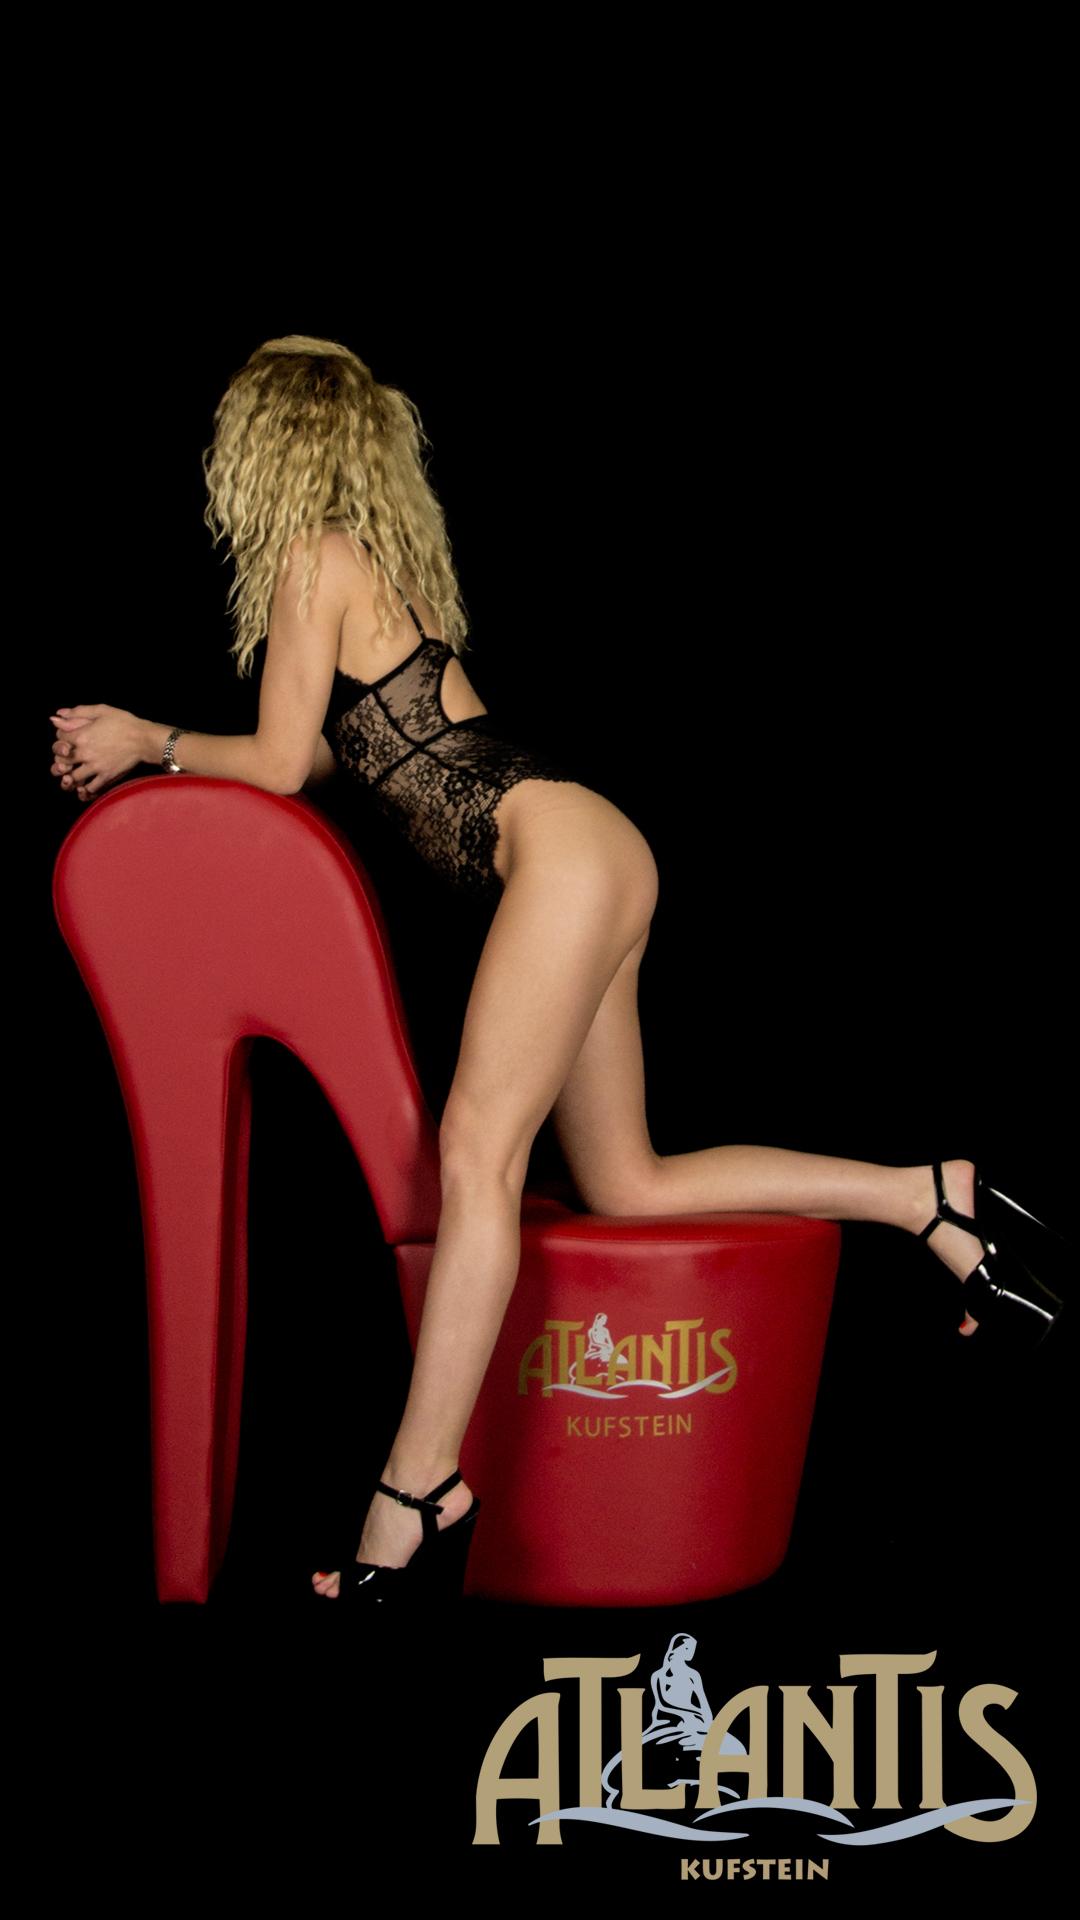 Christina sexy schlanke Blondine